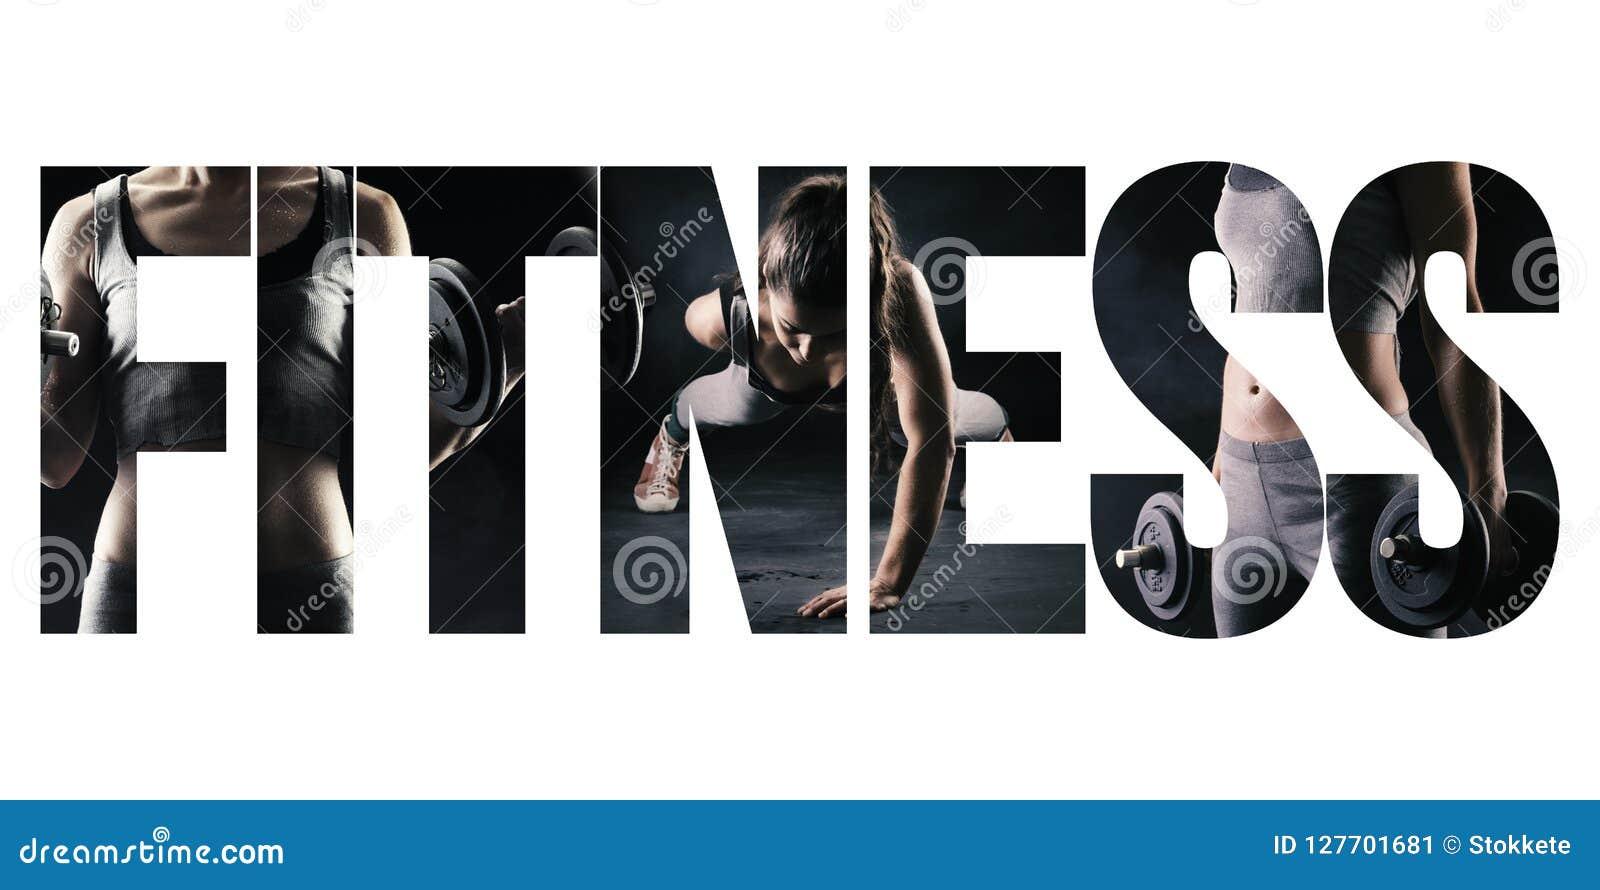 Kondition, sund livsstil och sportbegrepp